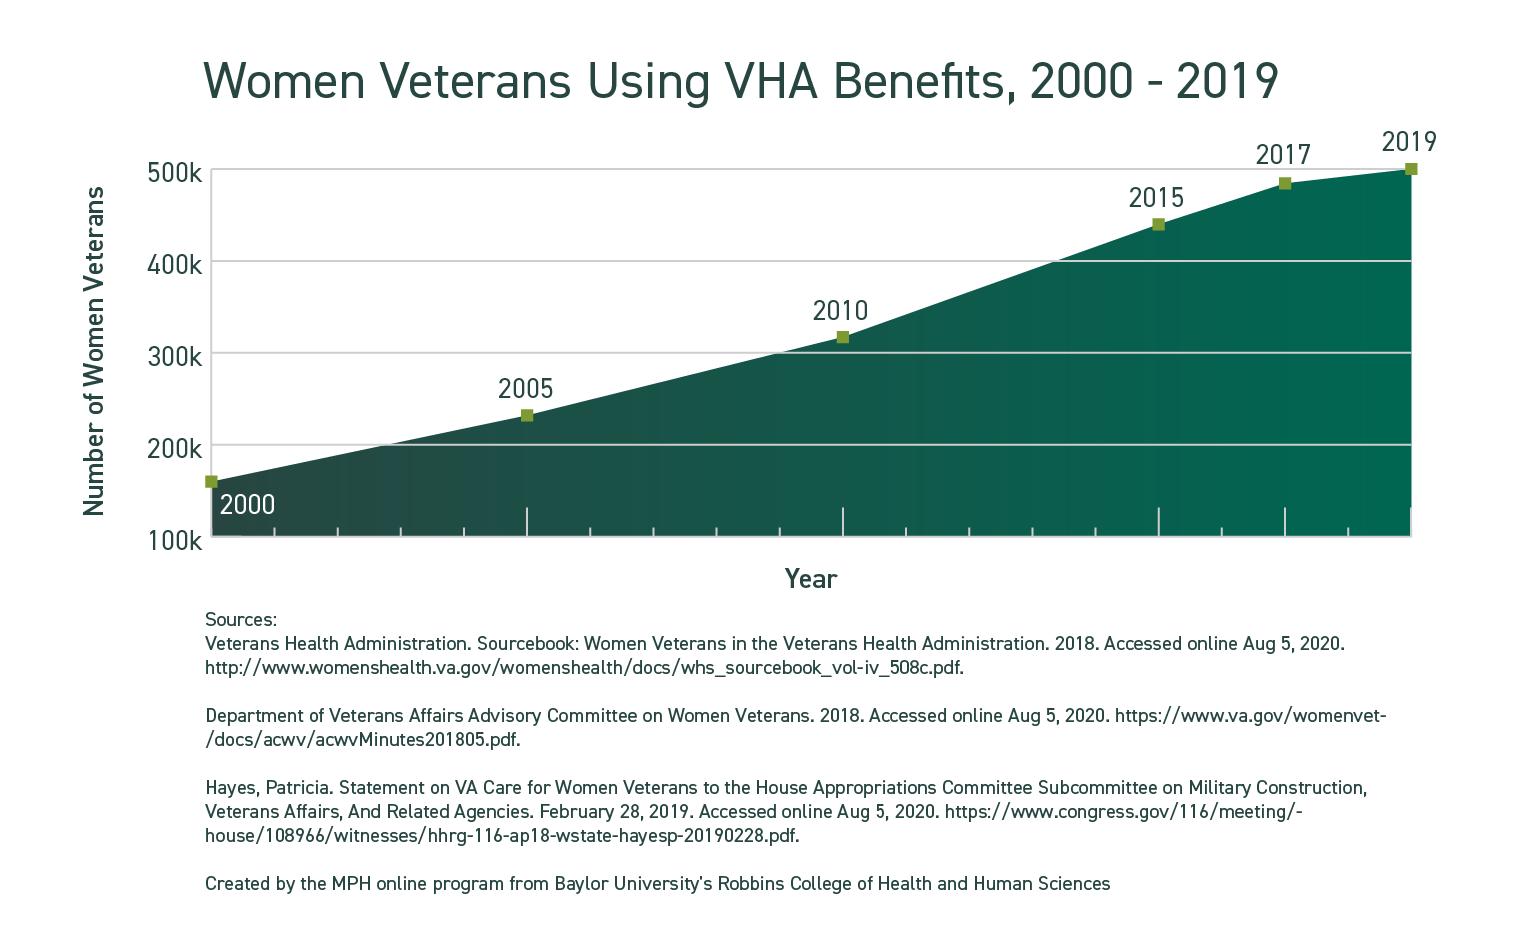 Women Veterans Enrolled in VHA Benefits, 2000 – 2019